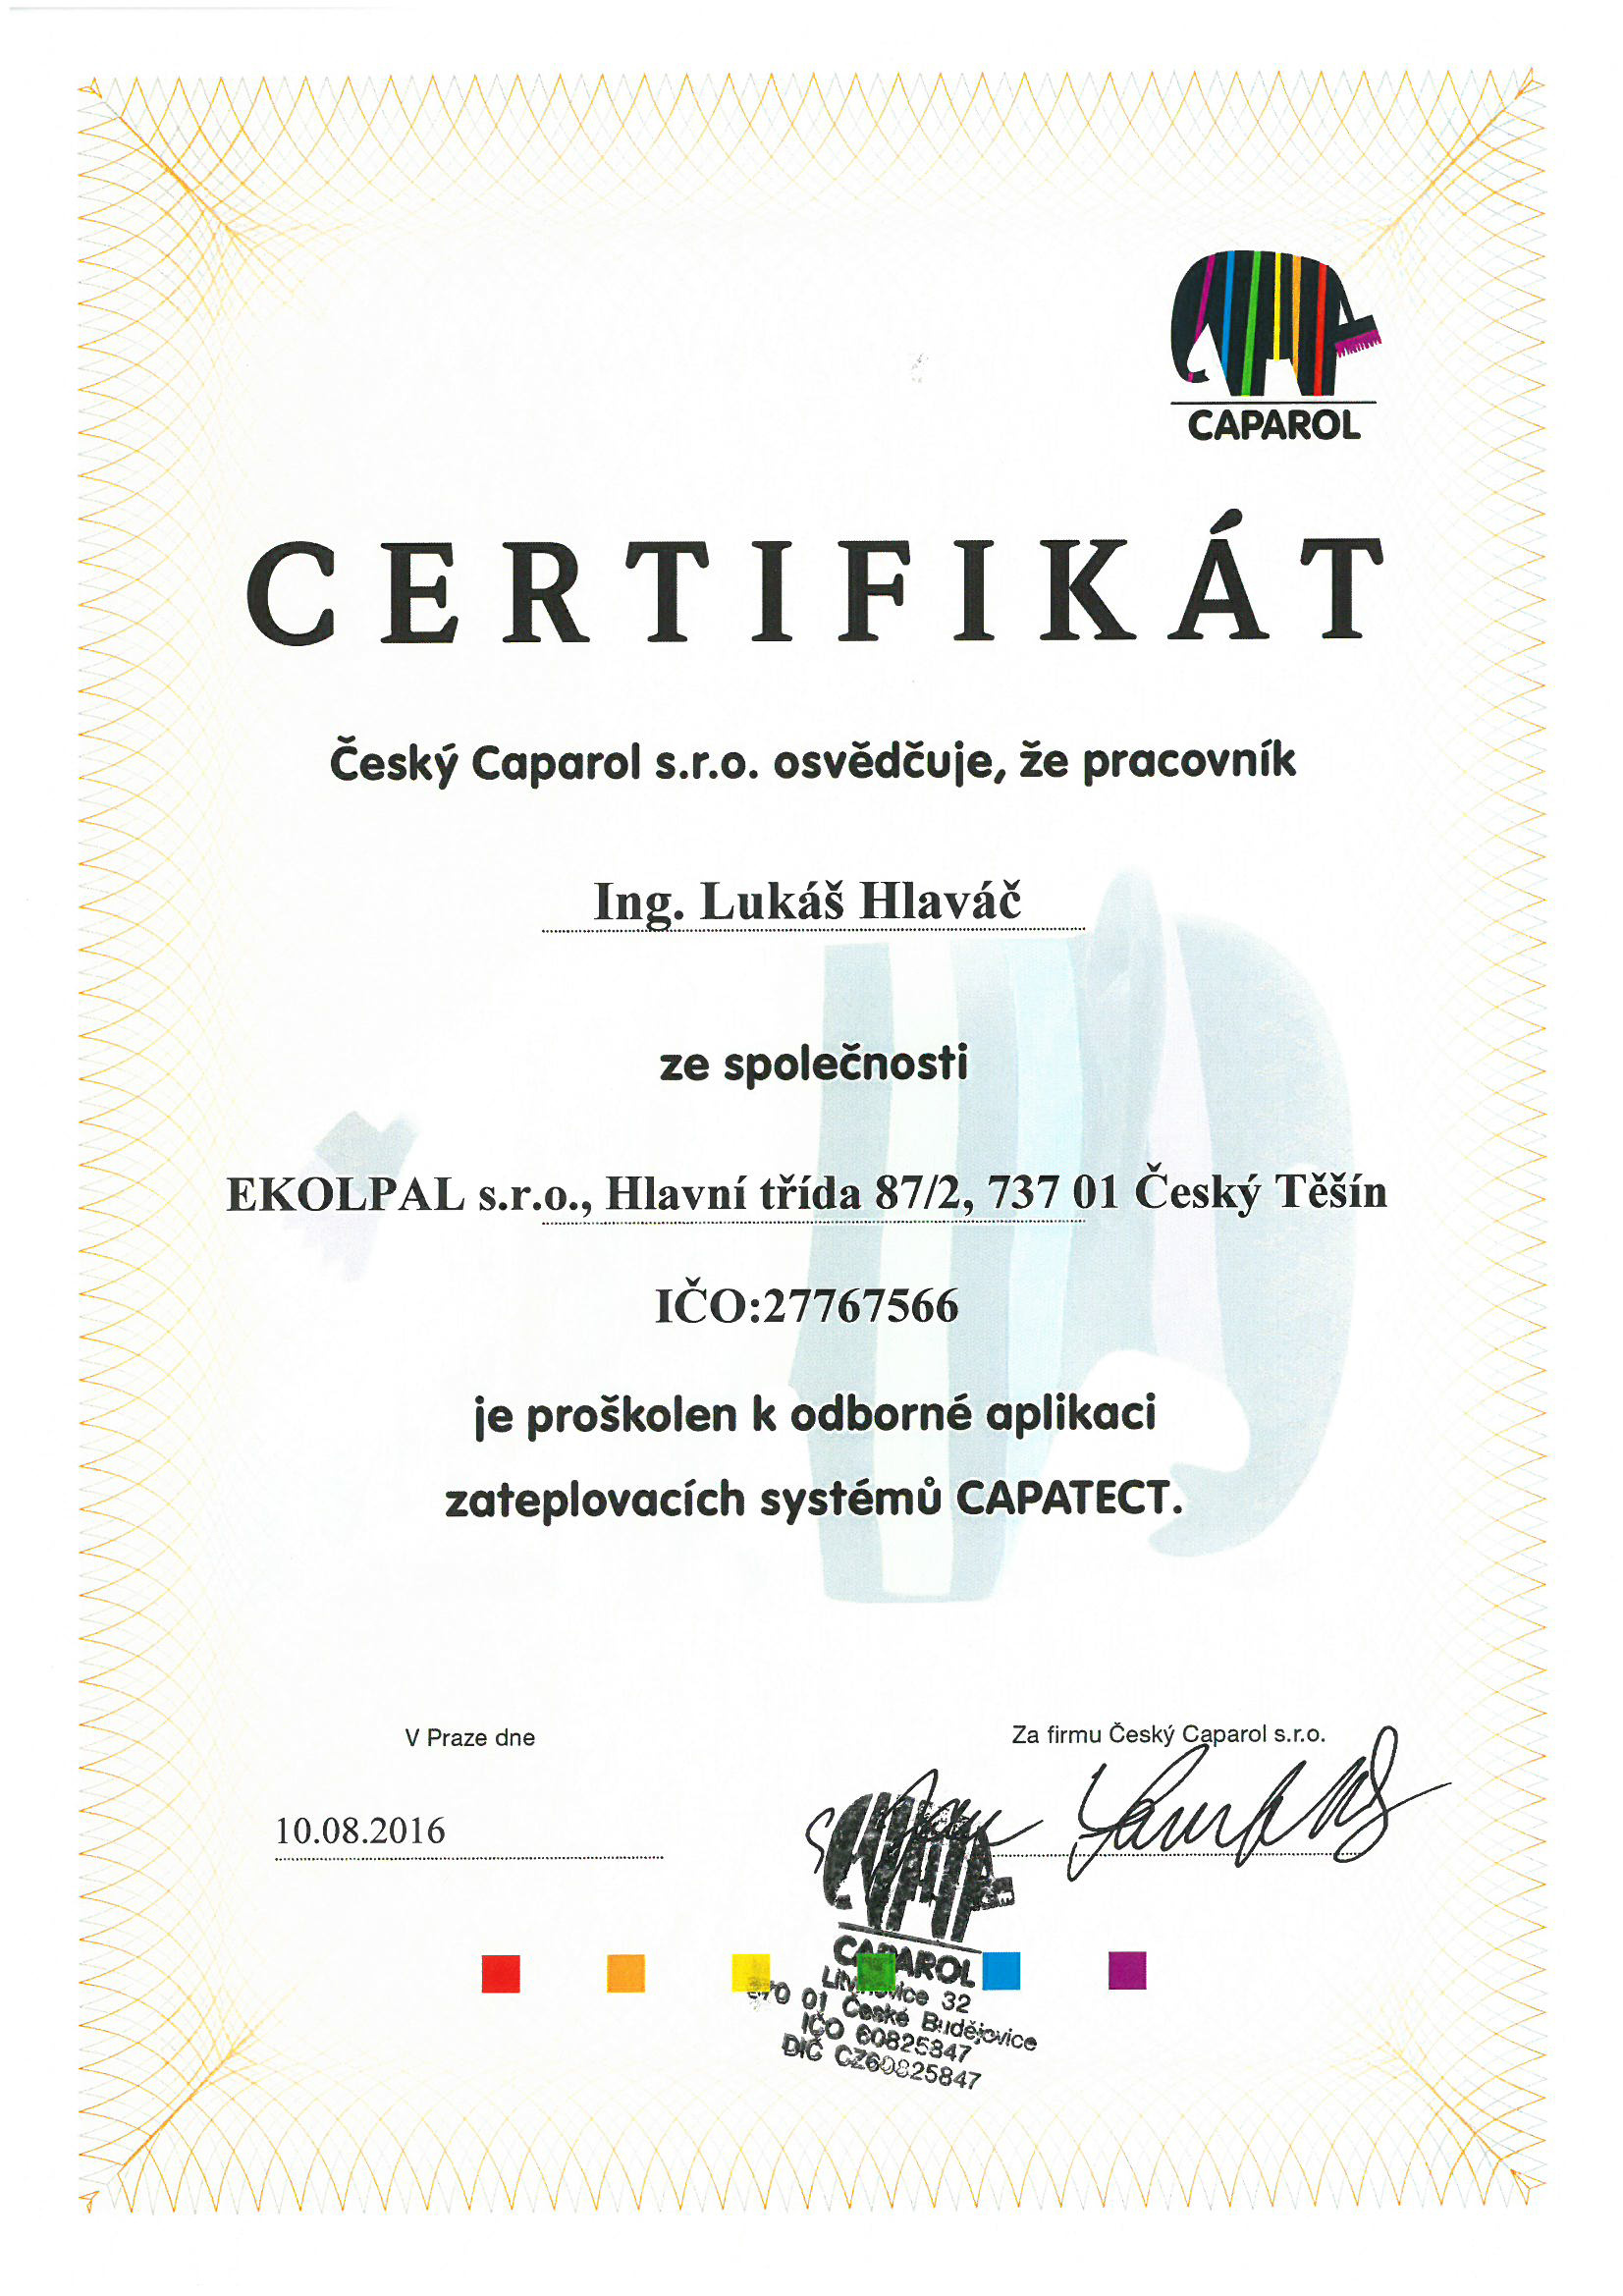 Caparol certifikát